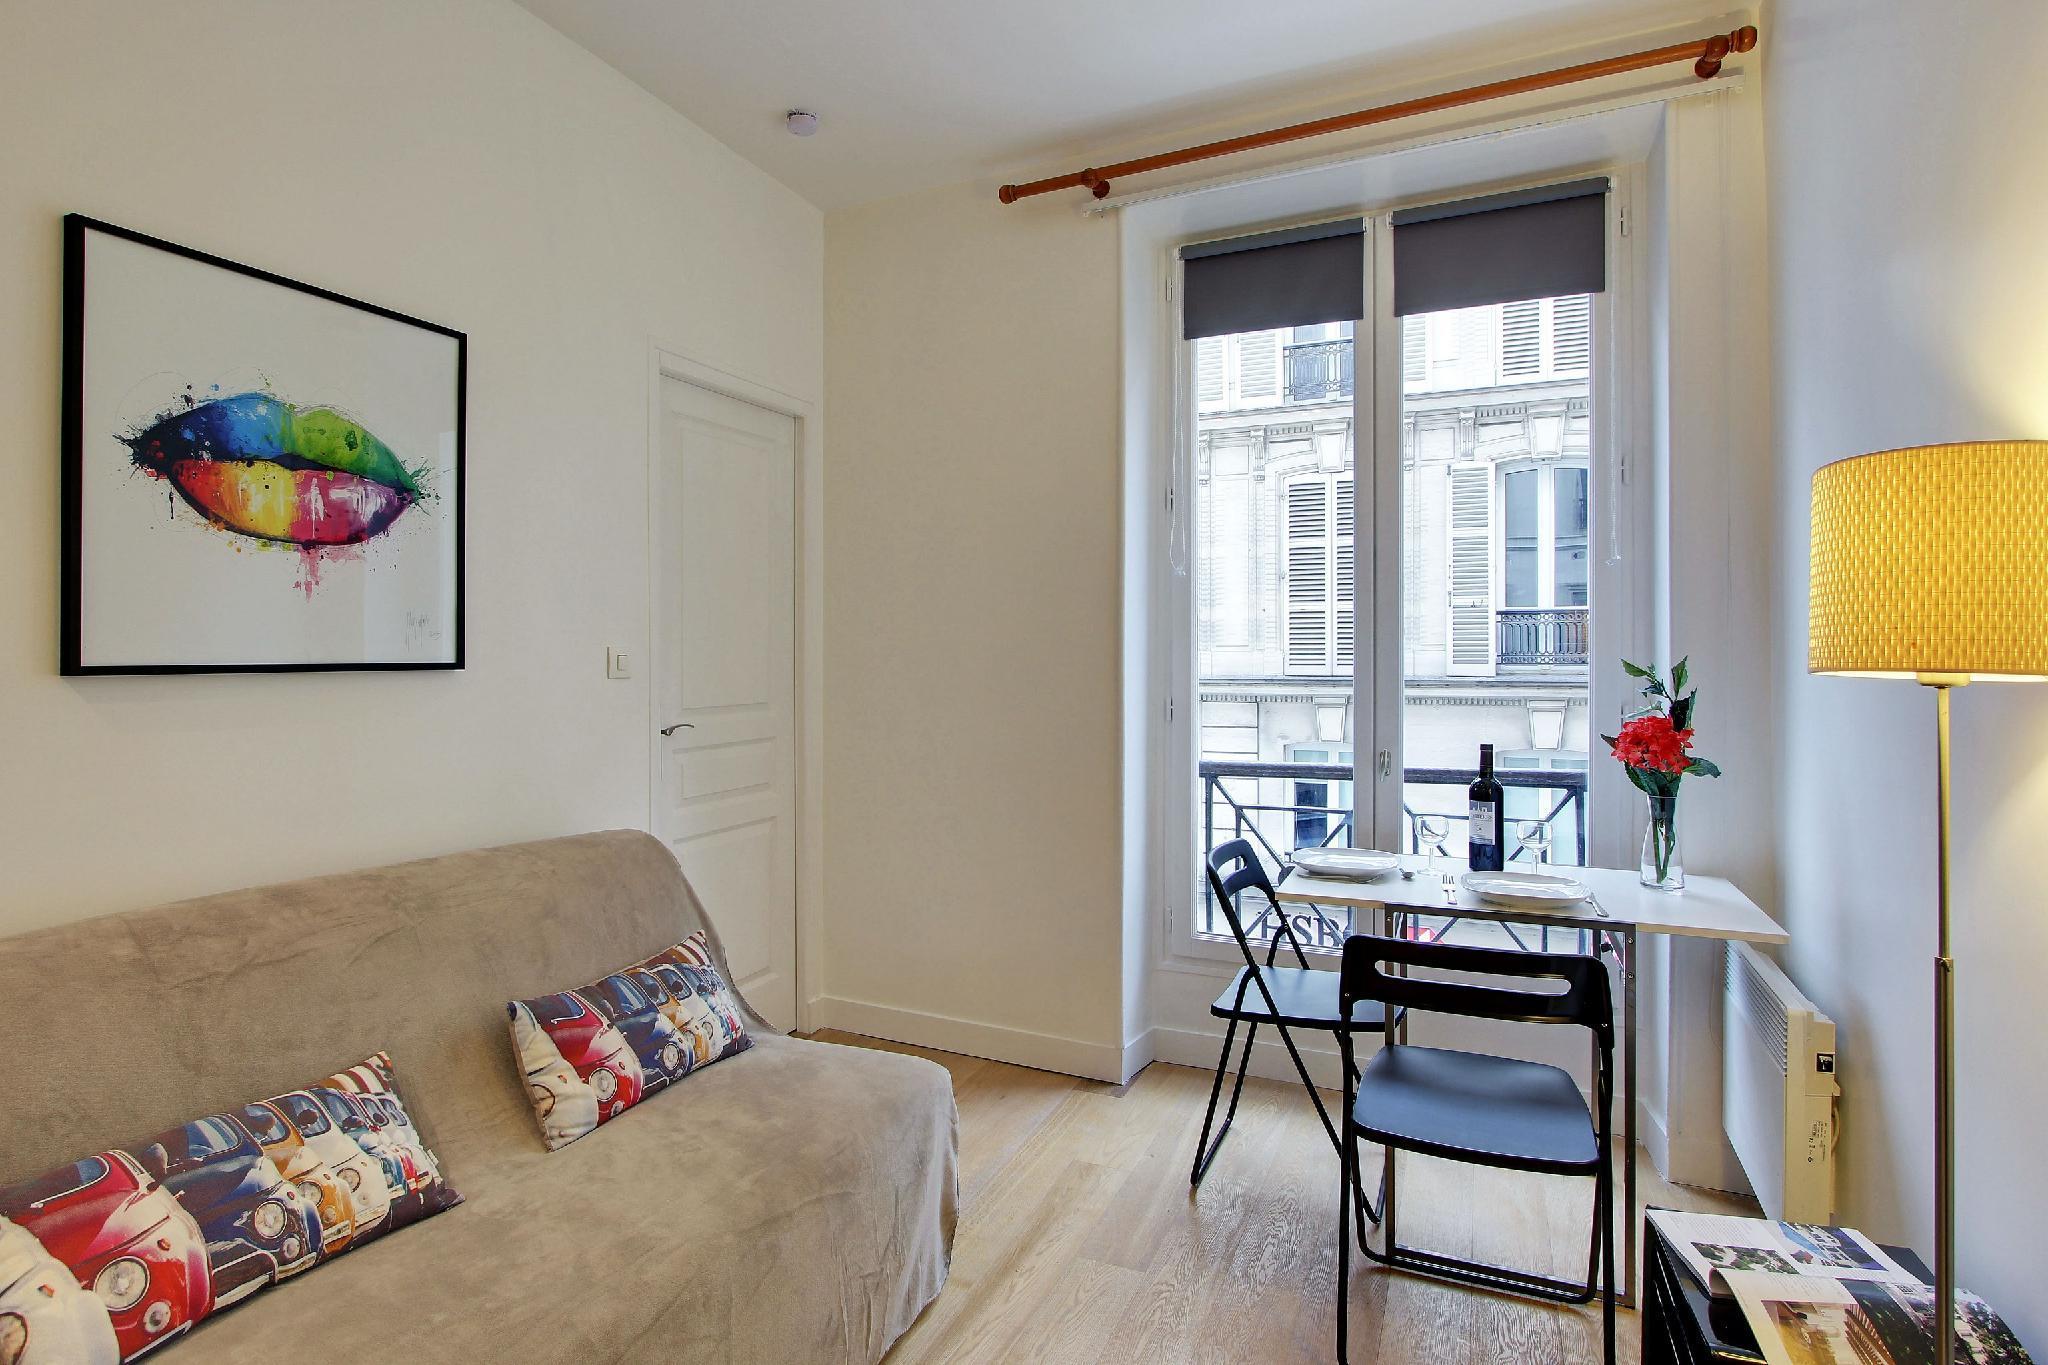 109116 - Great studio for 4 poeple near les Grands Boulevards